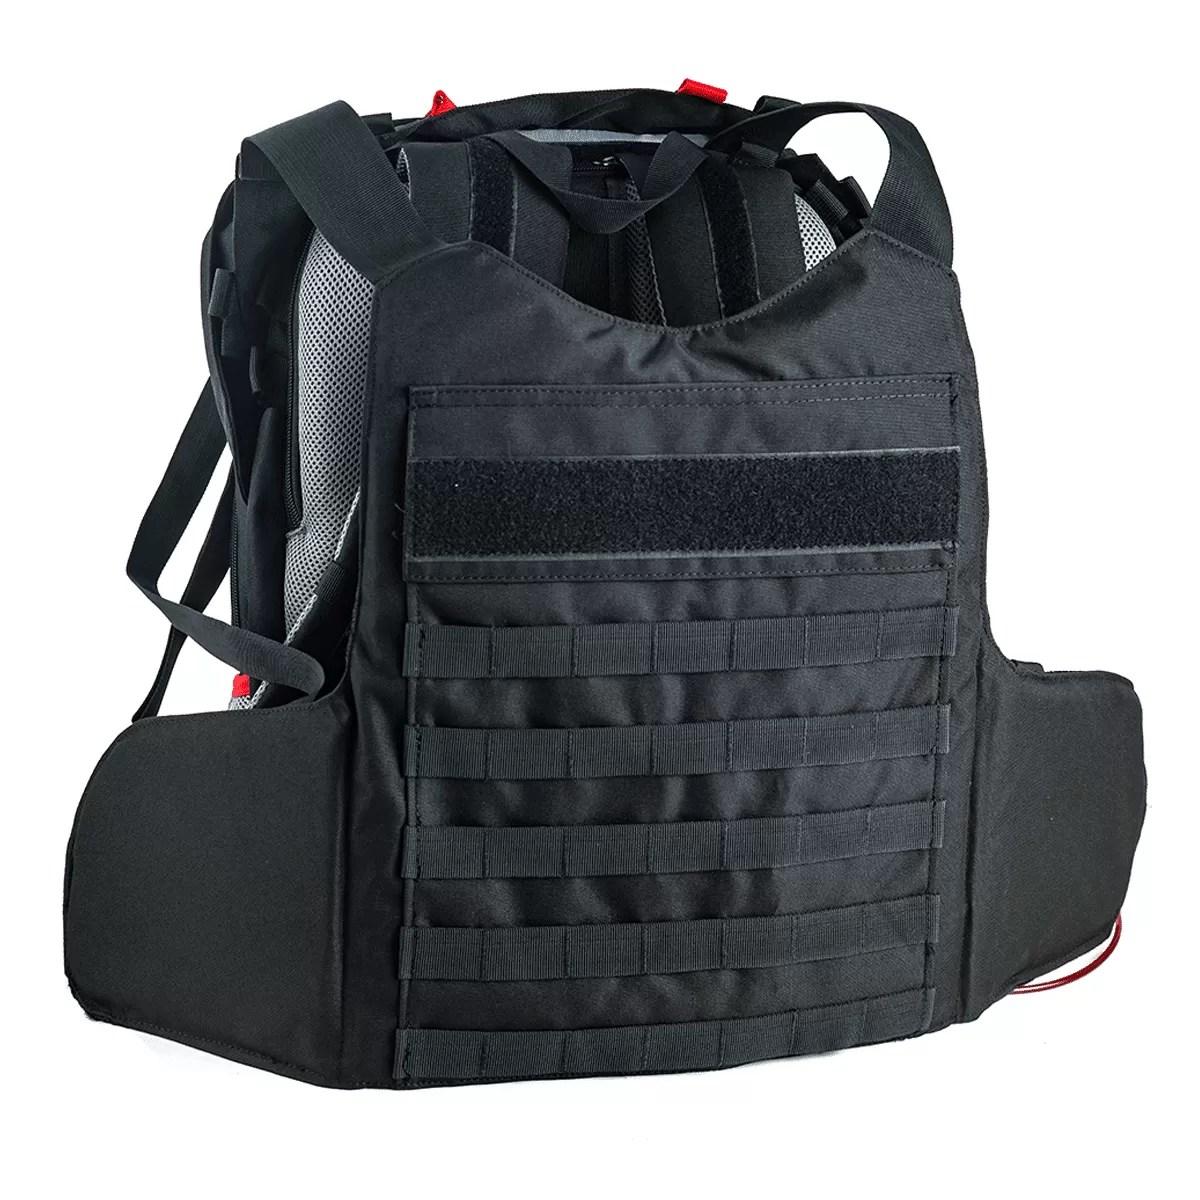 Canarmor_RANGER_bulletproof_backpack